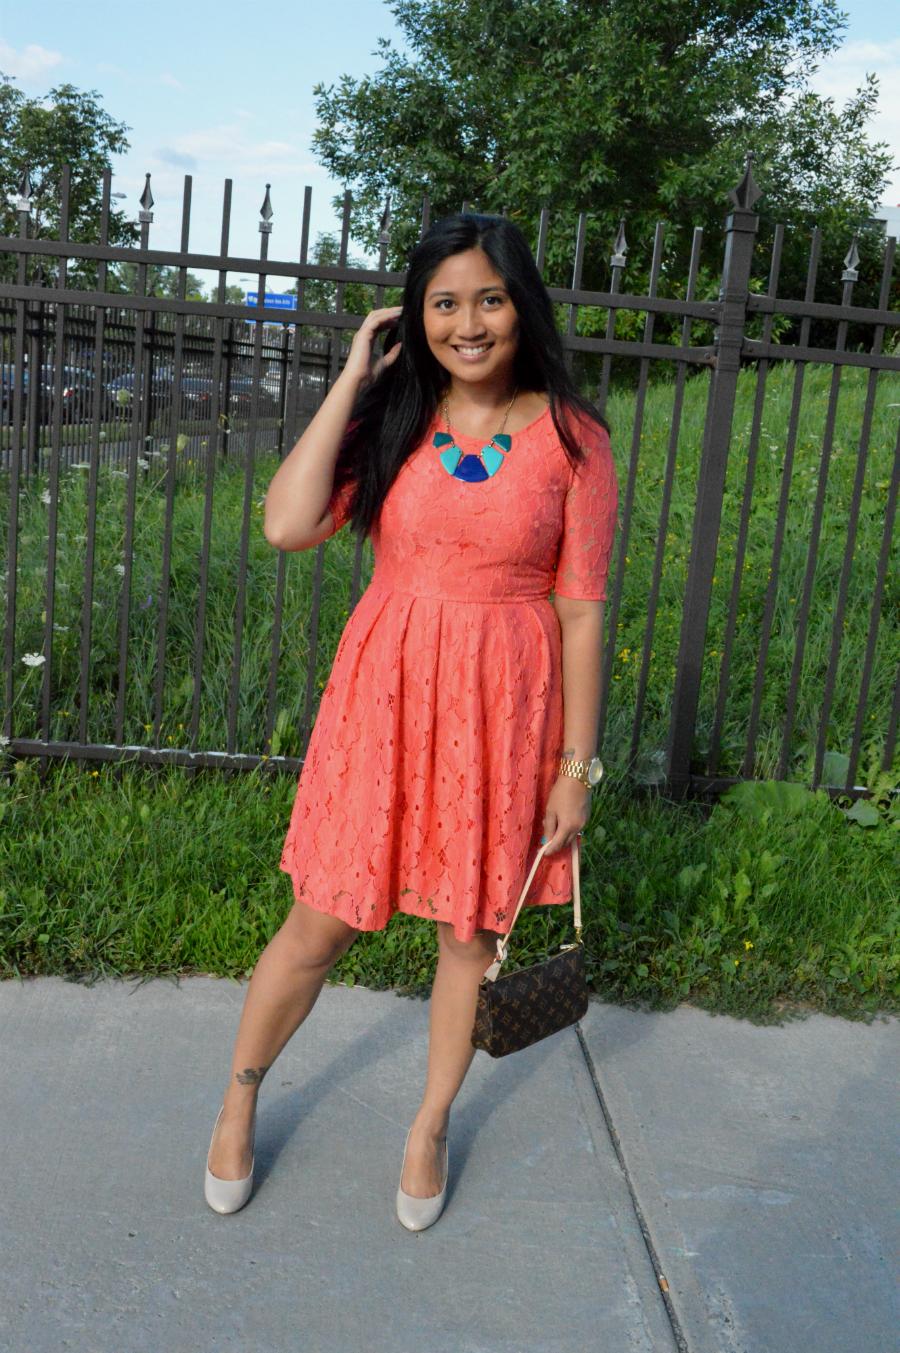 Coral Dress and a High School Graduation